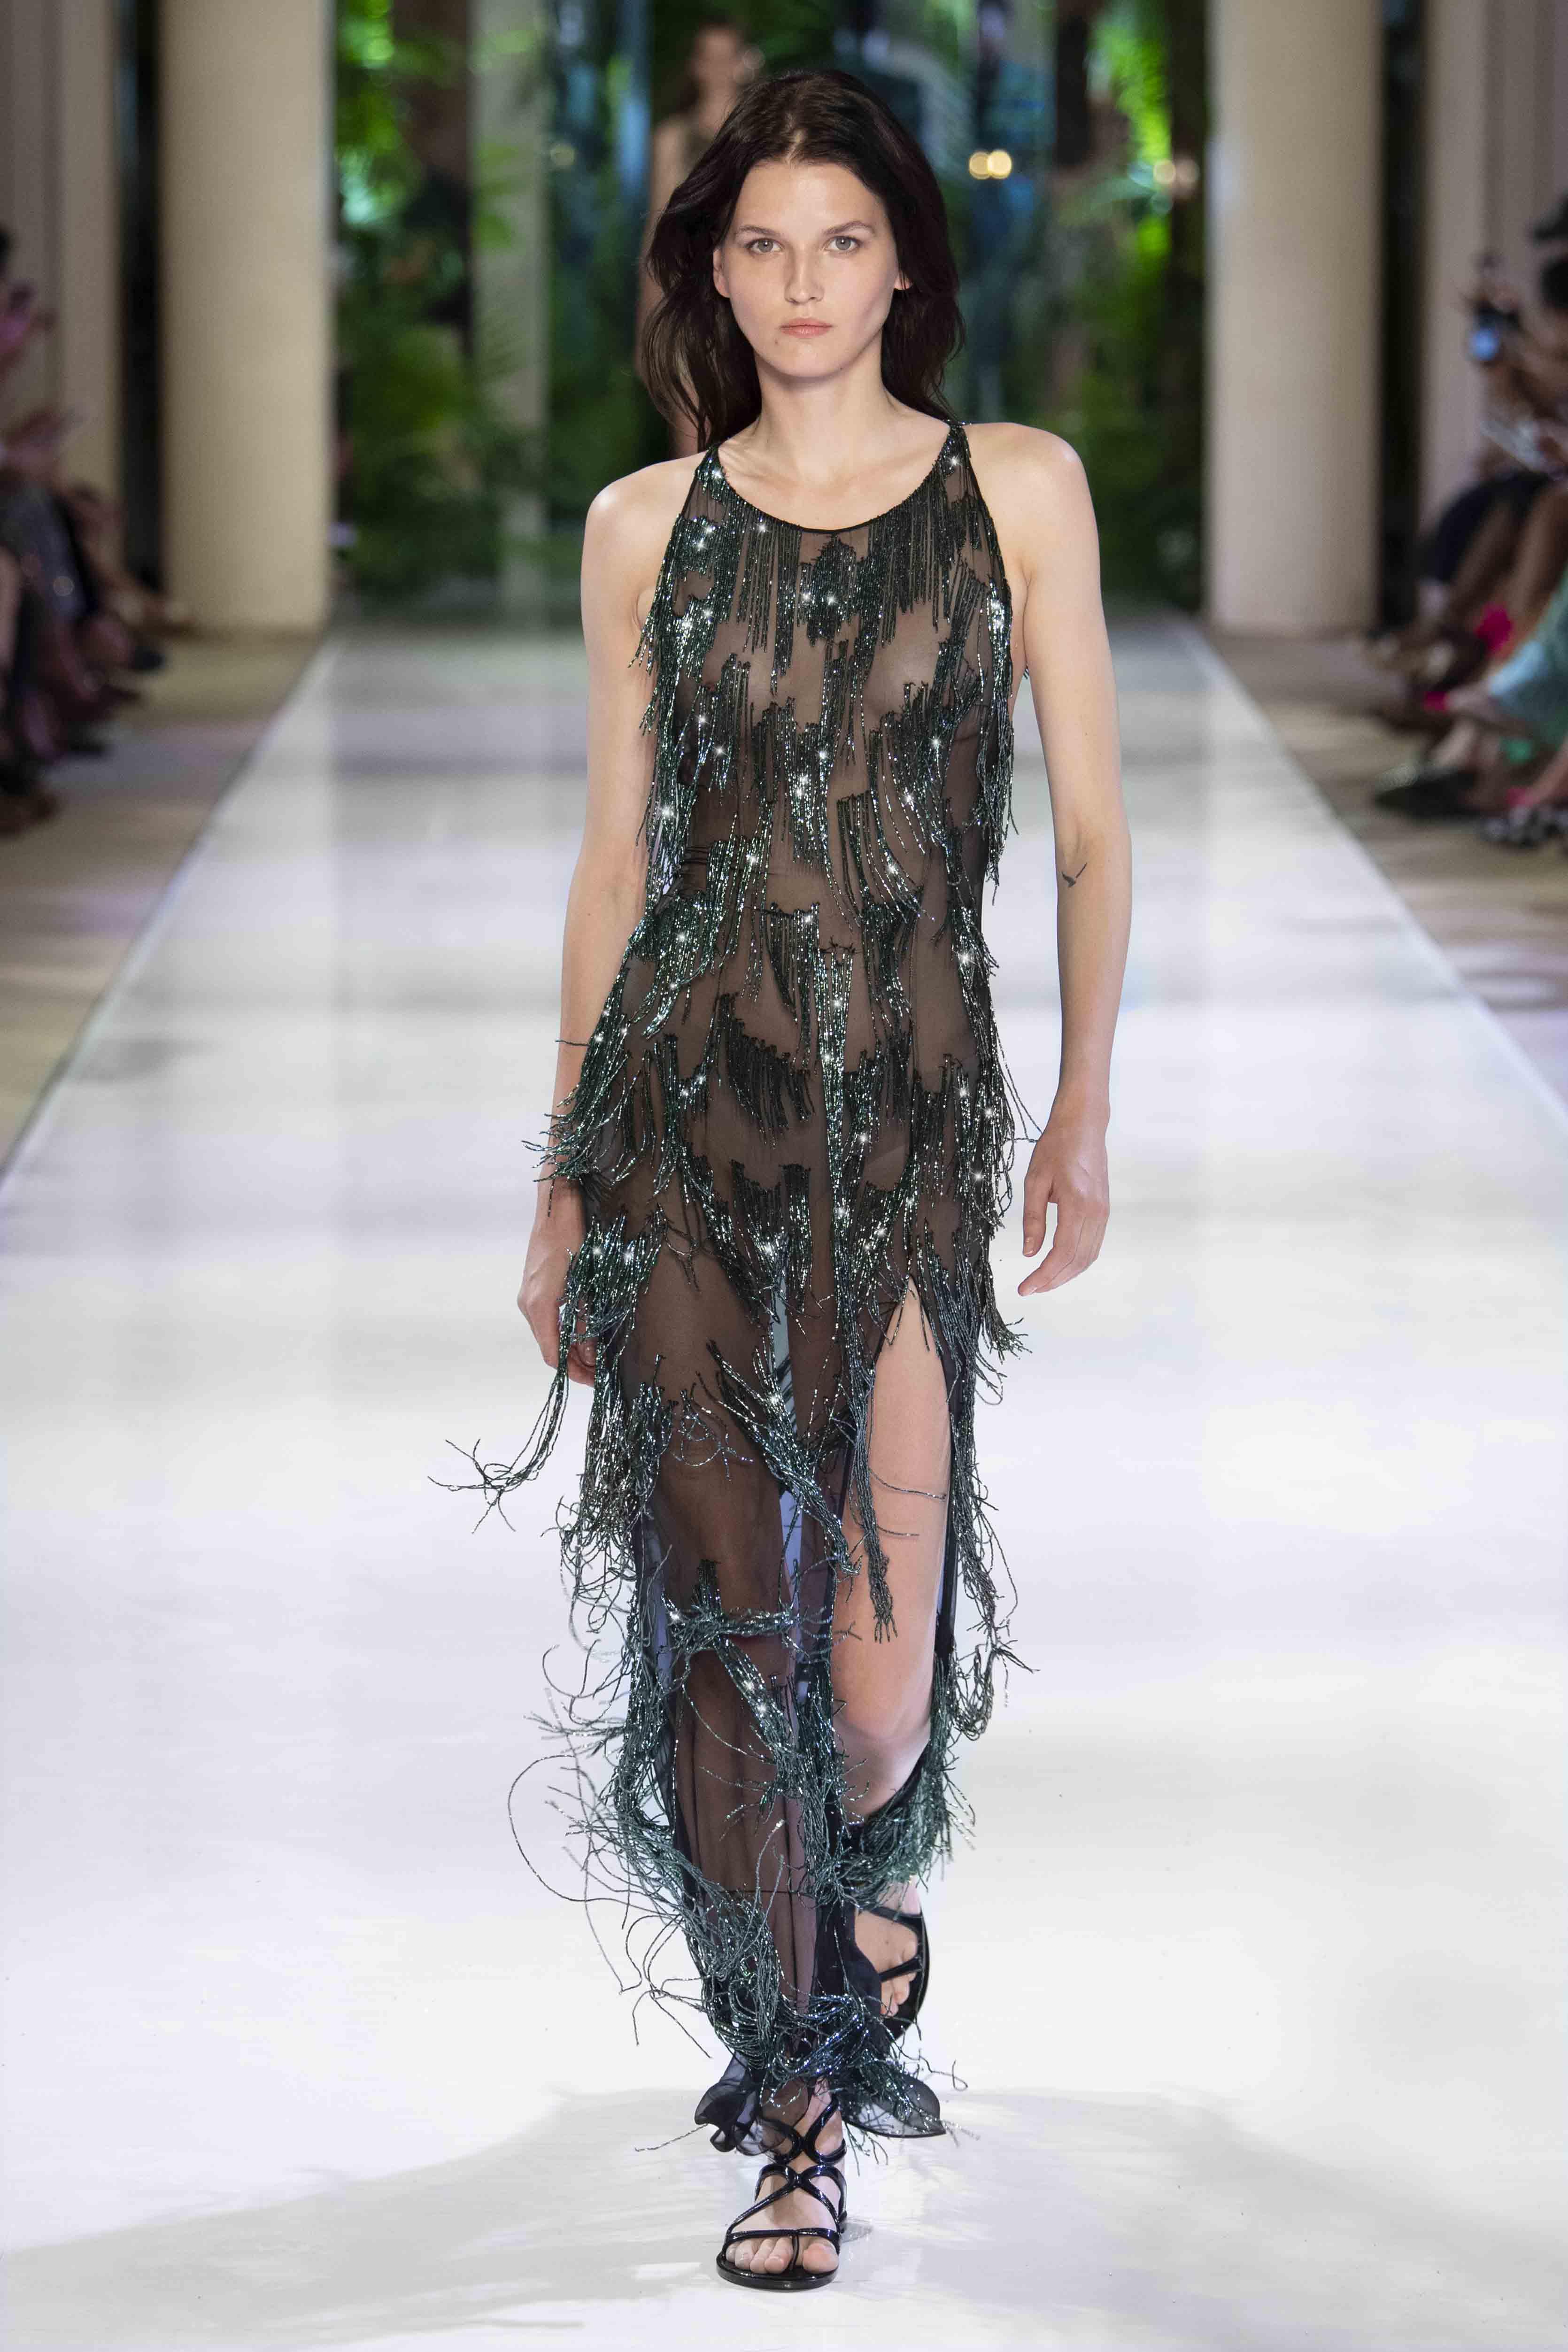 couture azzaro fall winter 40 magazine runway vogue models haute